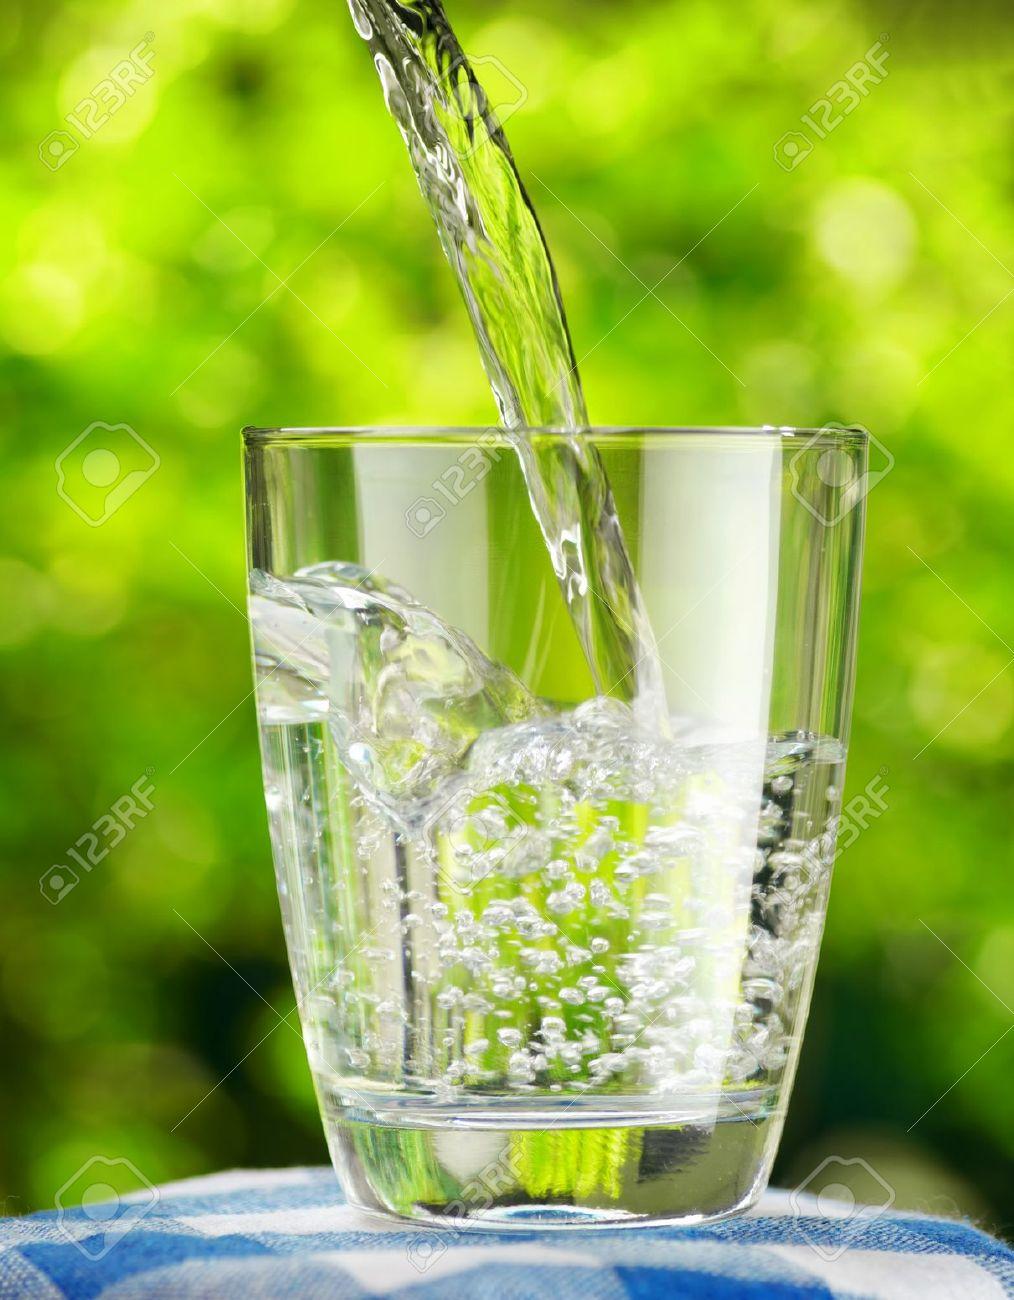 glass of water.jpg